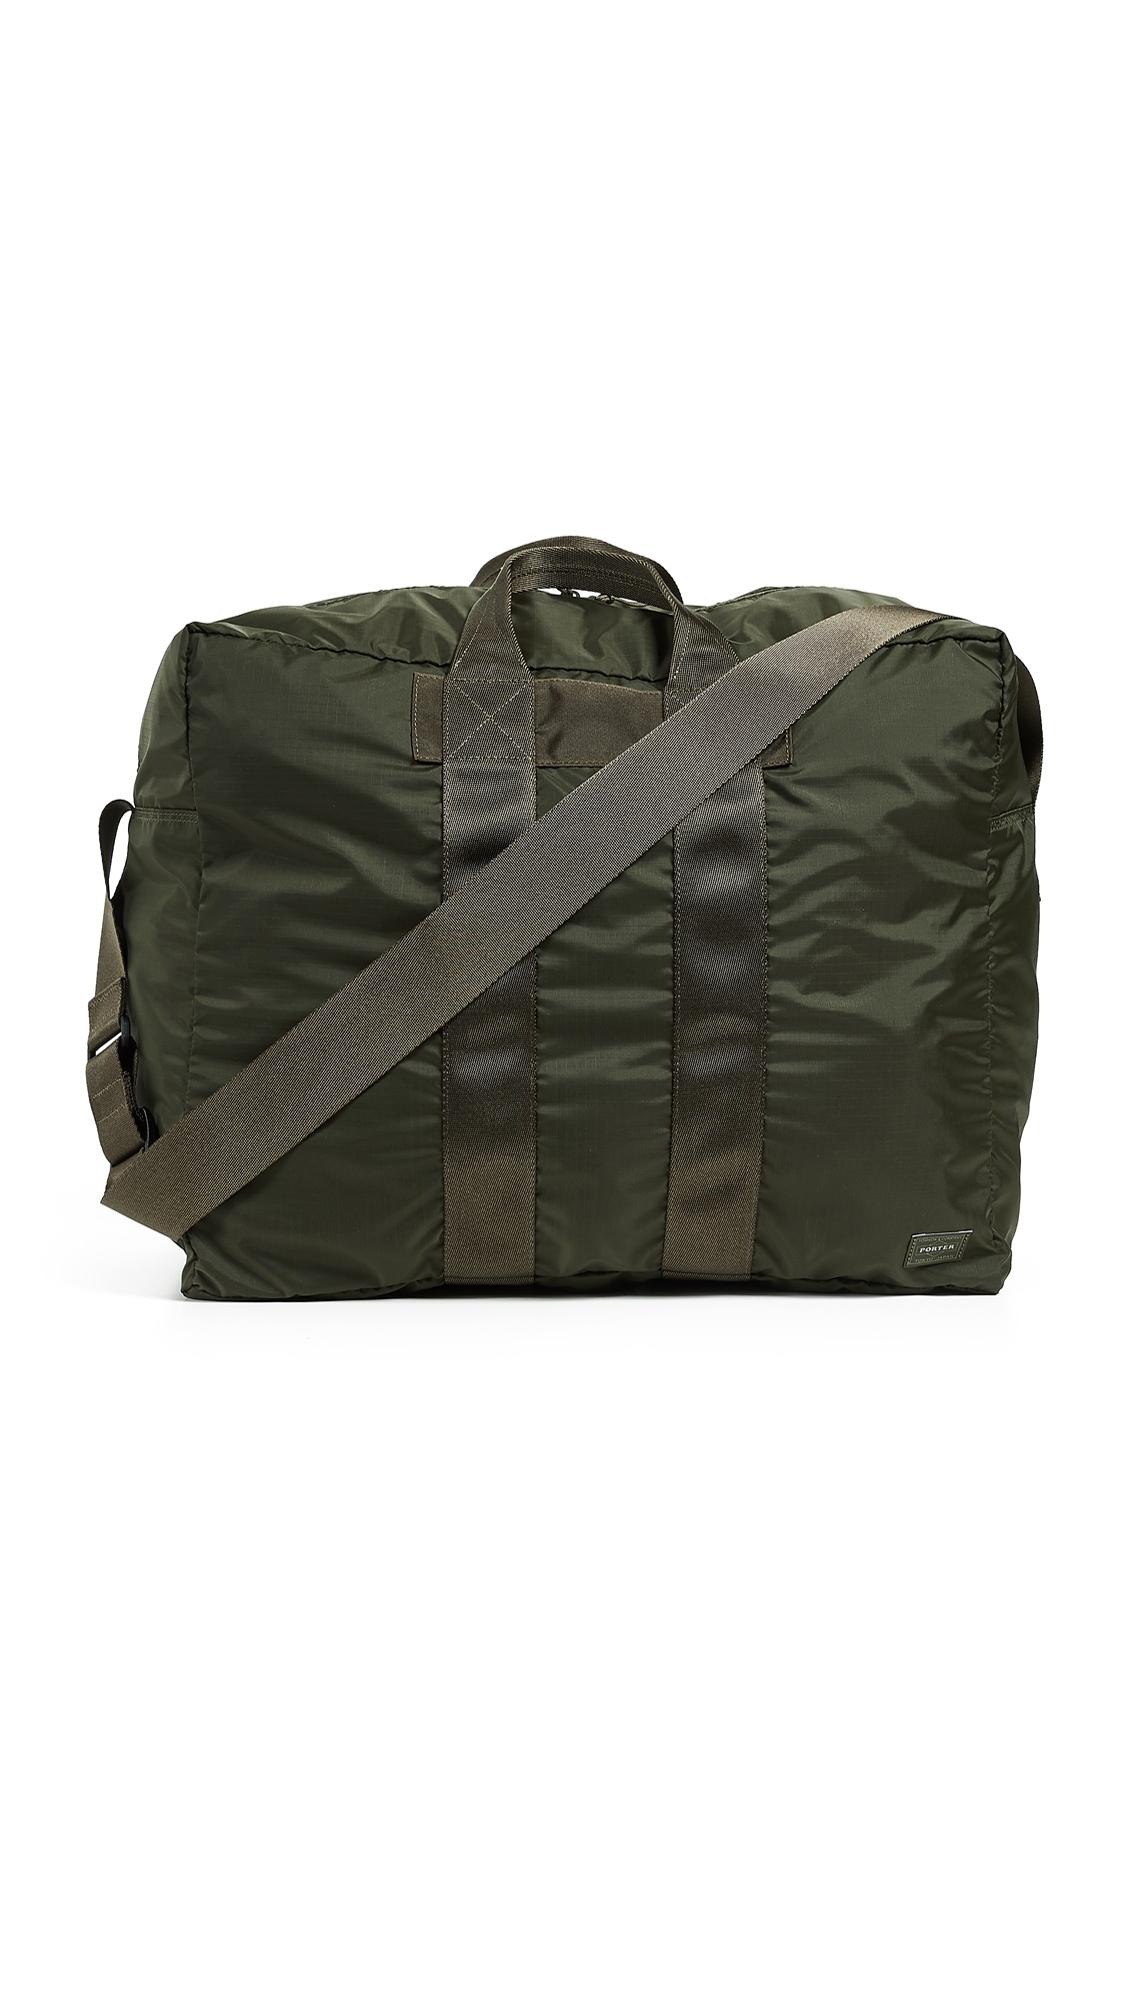 PORTER Flex 2 Way Duffel Bag in Olive